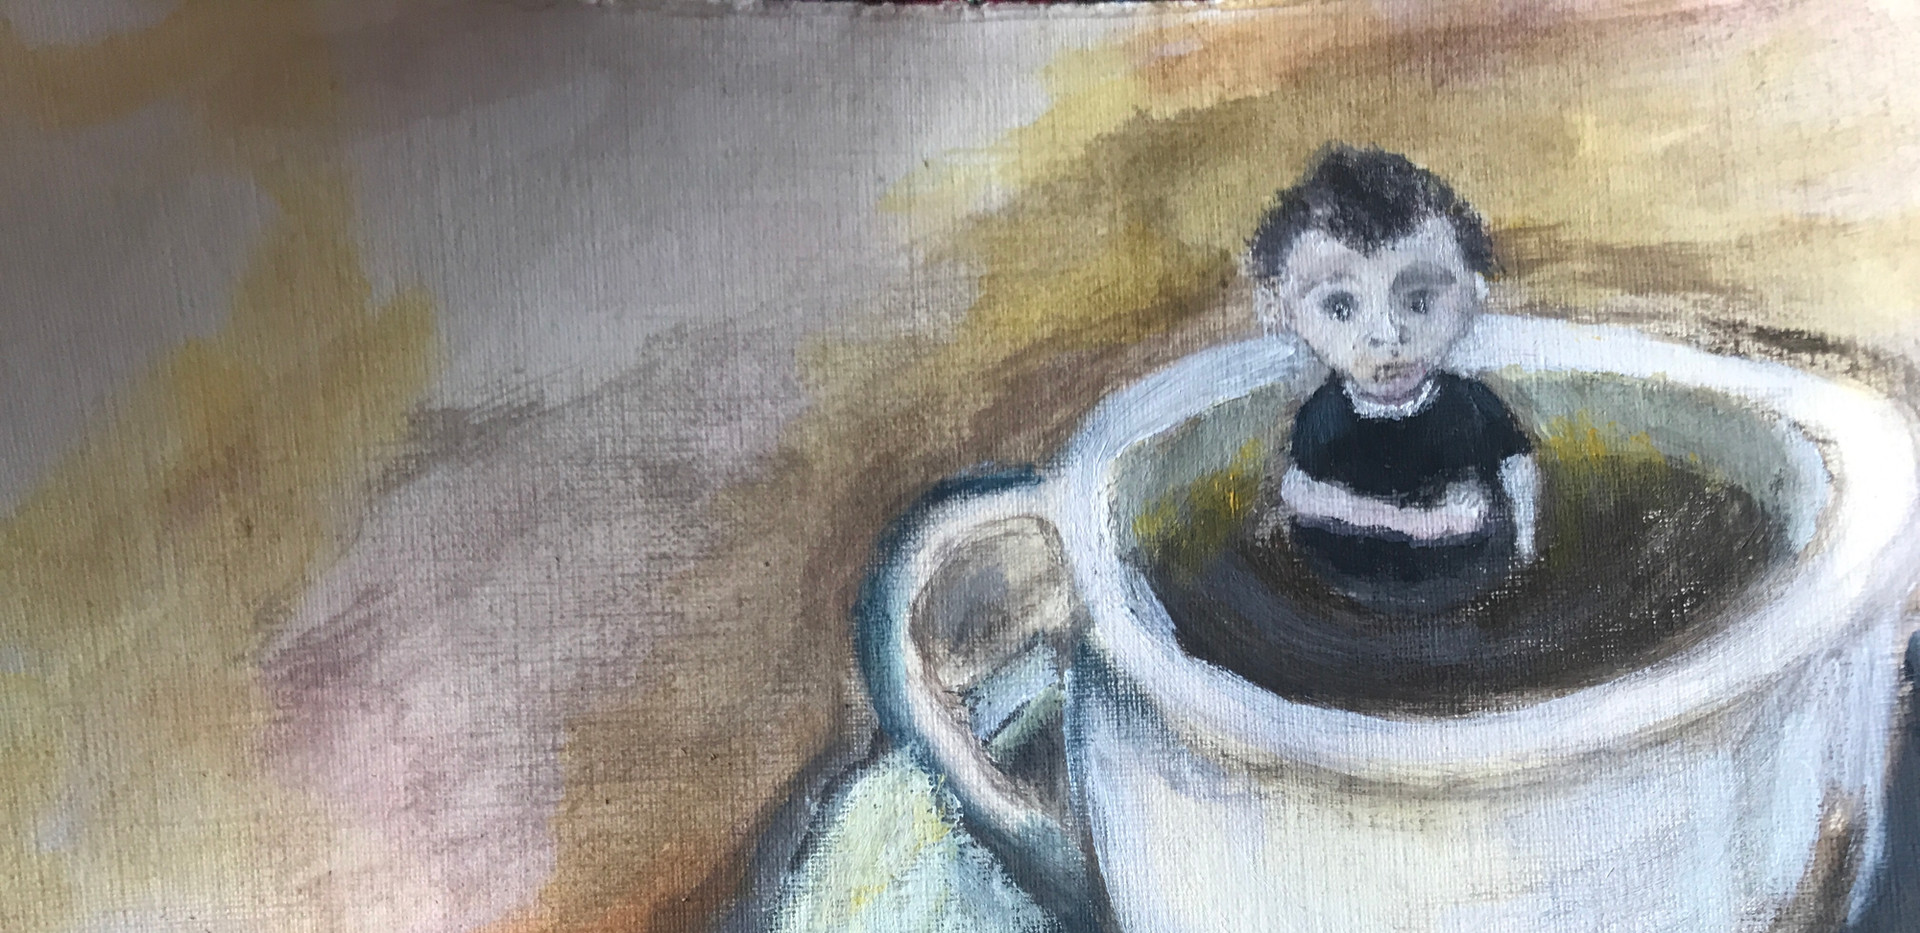 Coffee, Tea, or Earl Gray